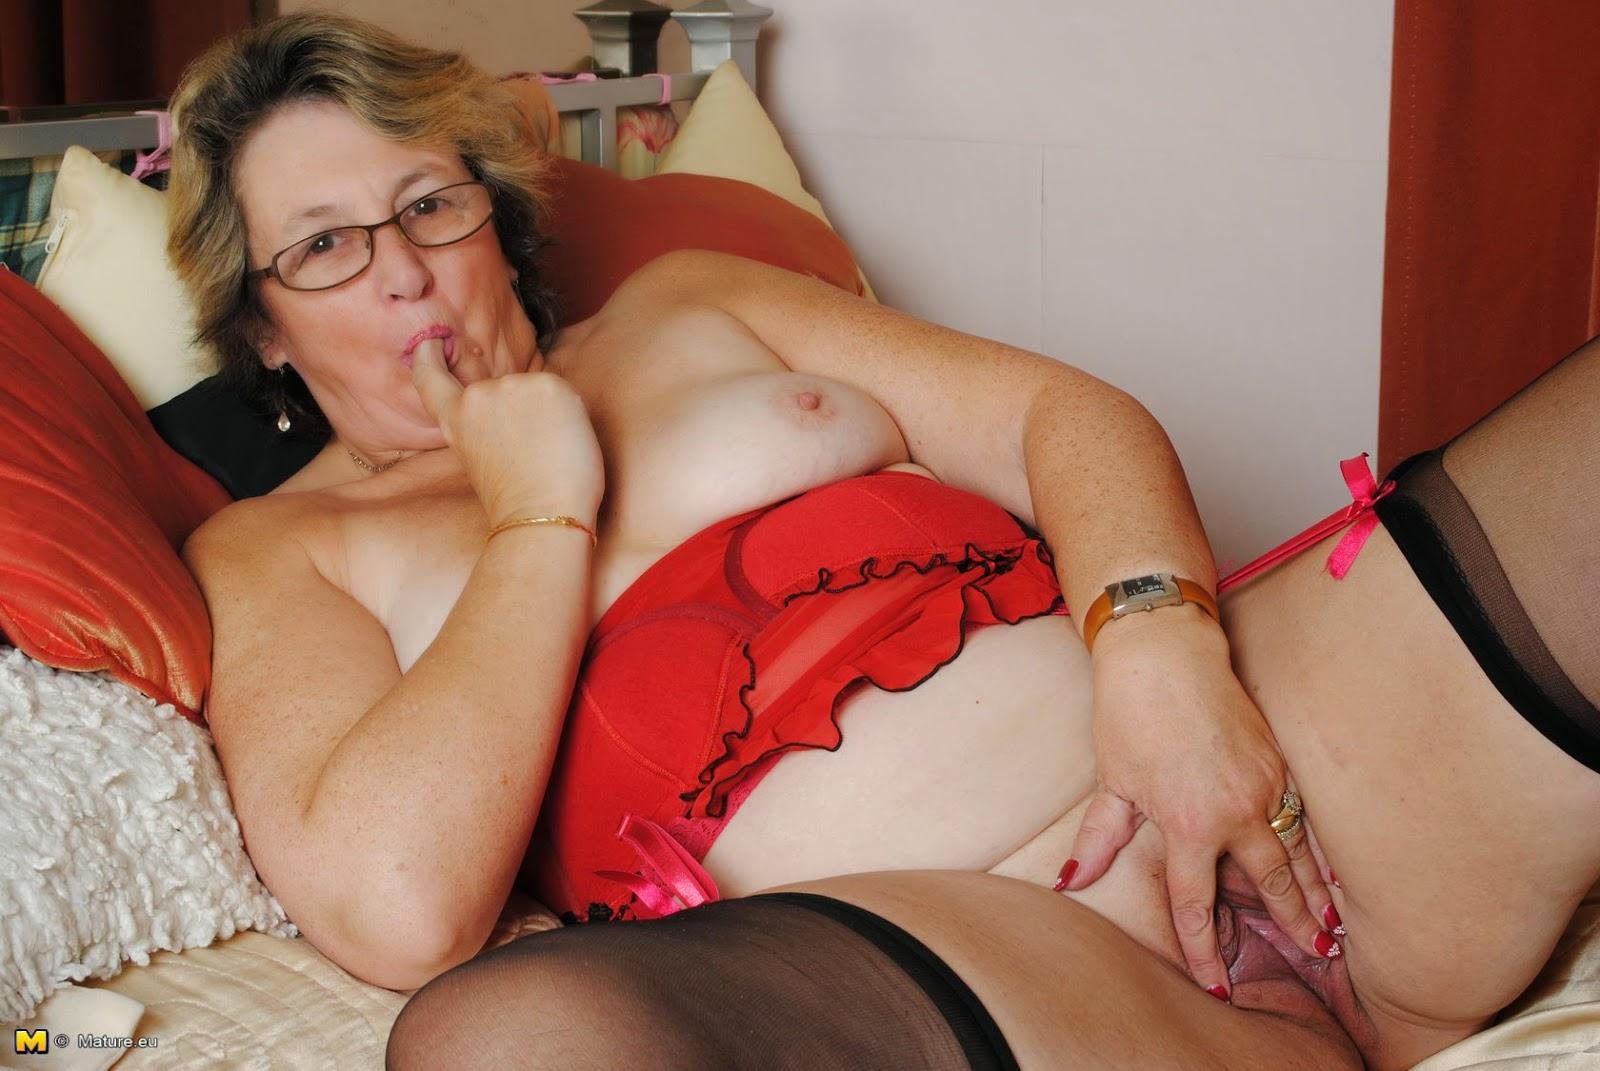 Bbw granny lingerie